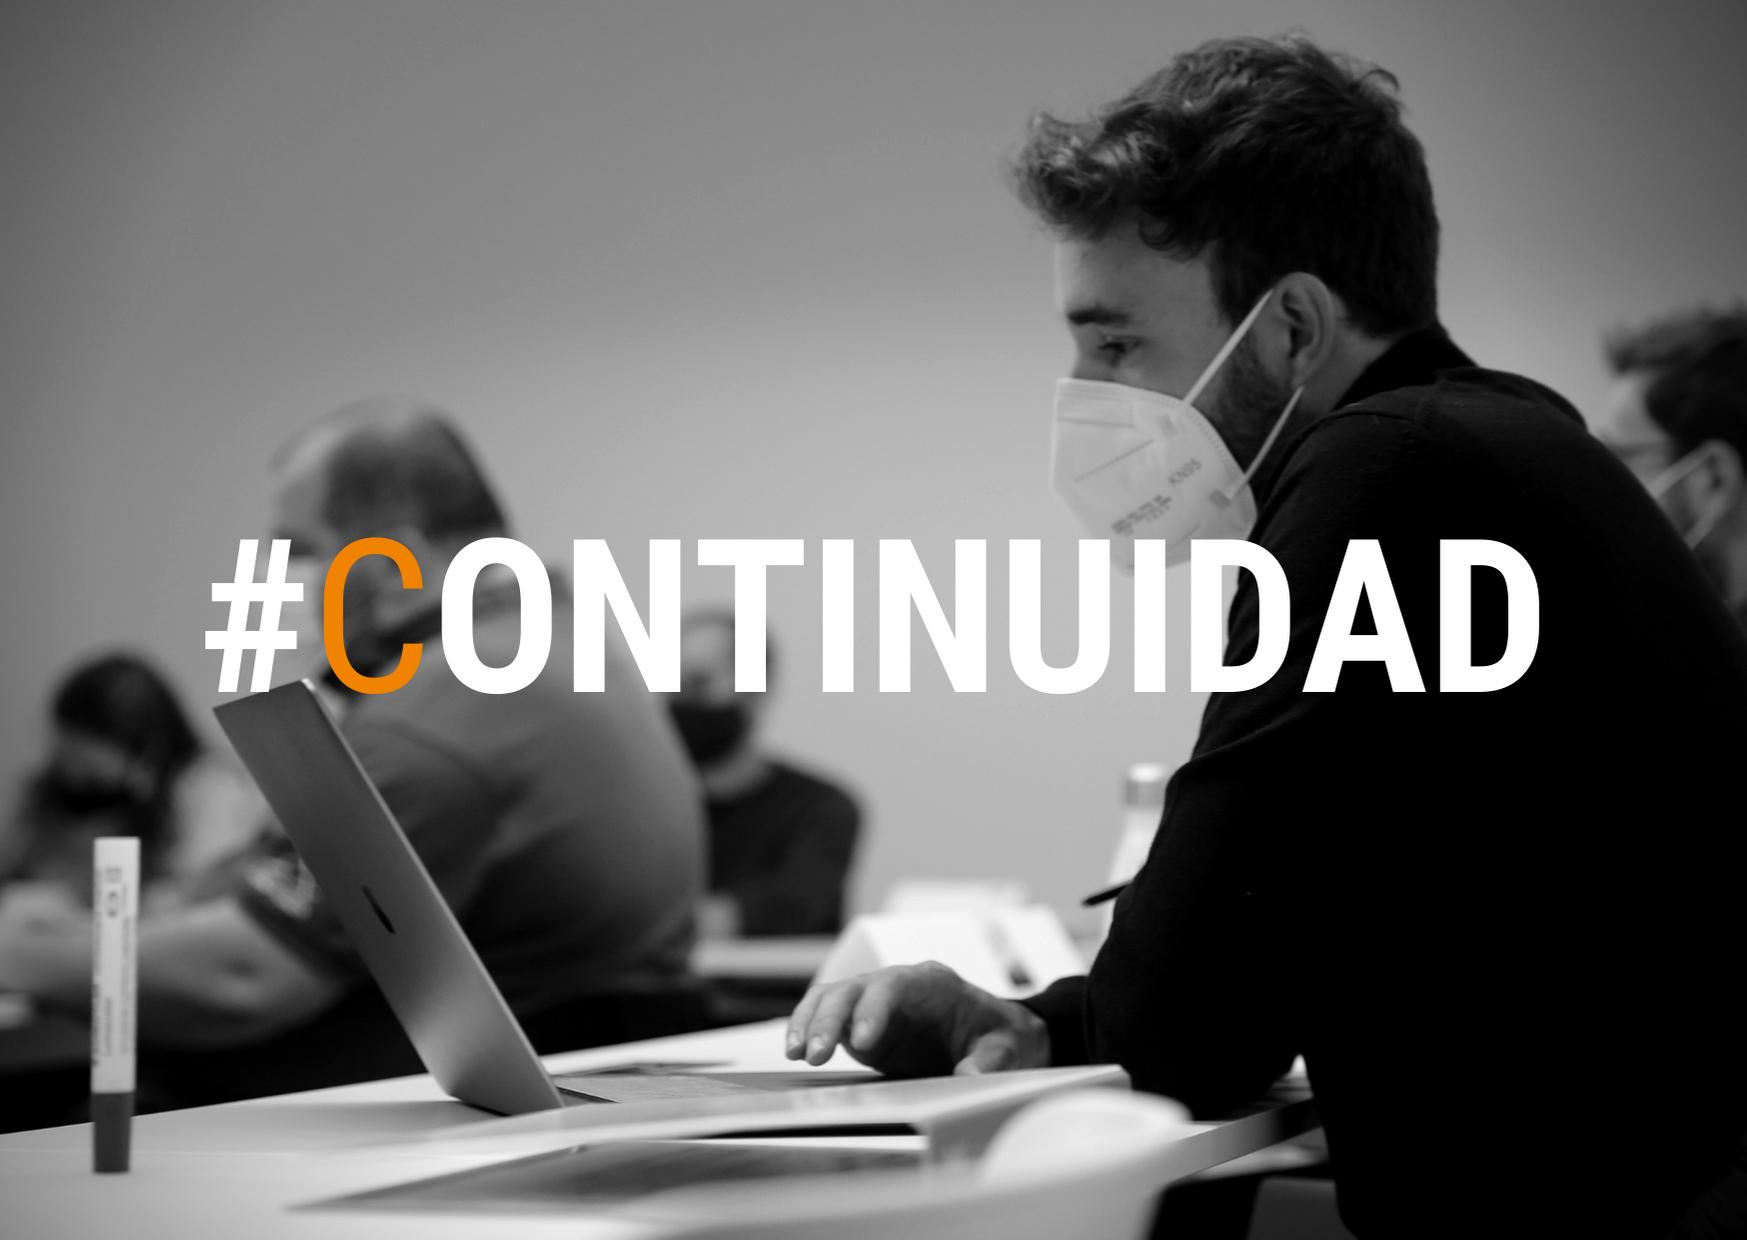 #Continuidad